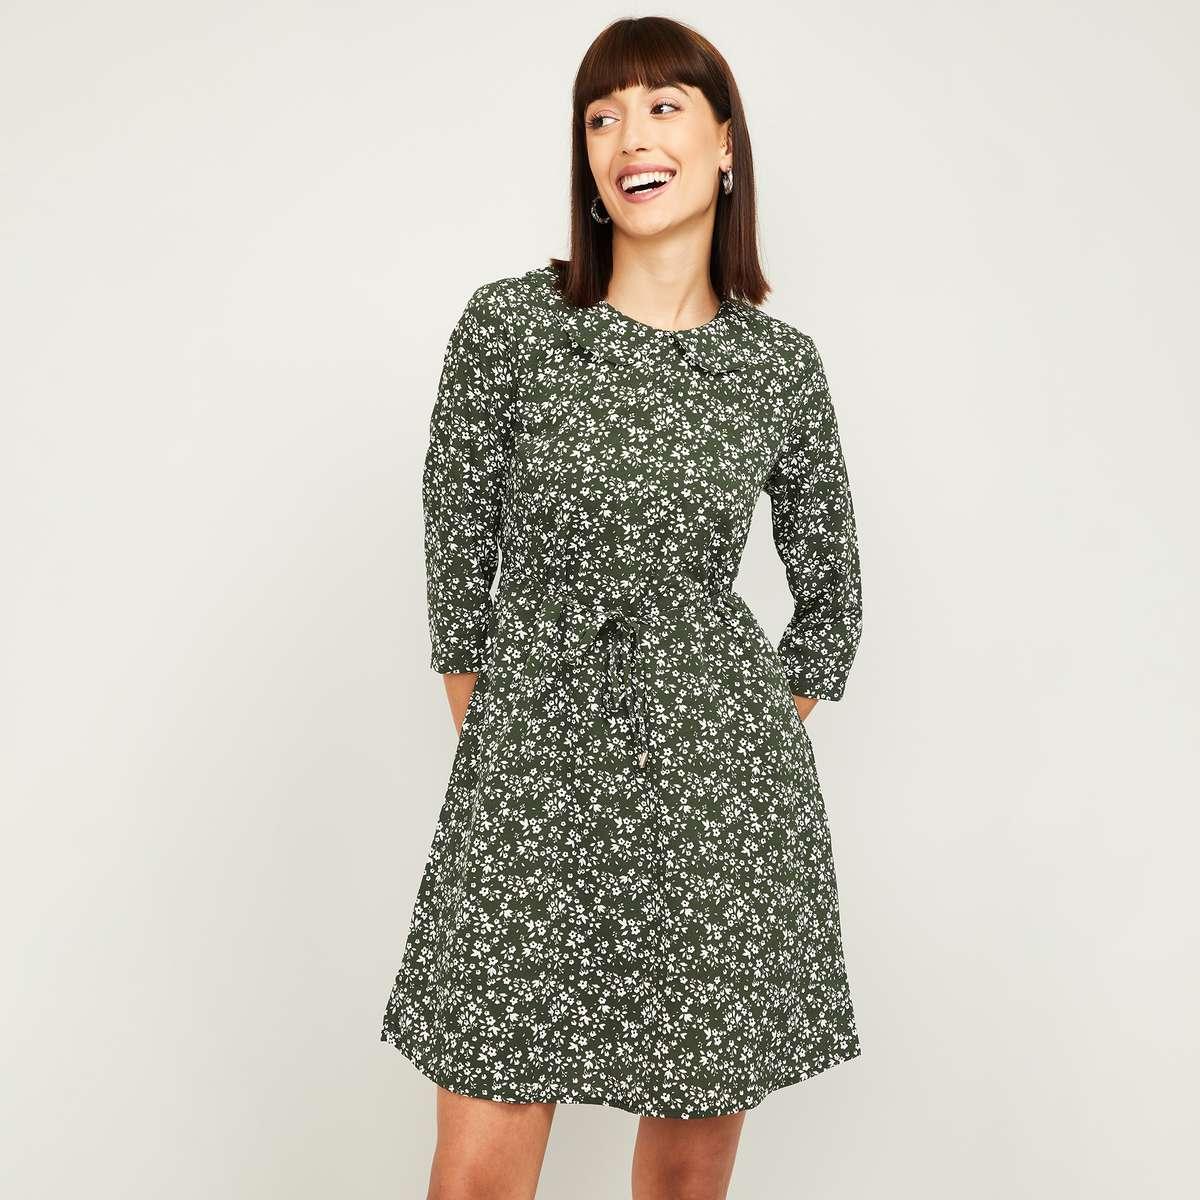 2.FAME FOREVER Women Floral Print A-Line Dress